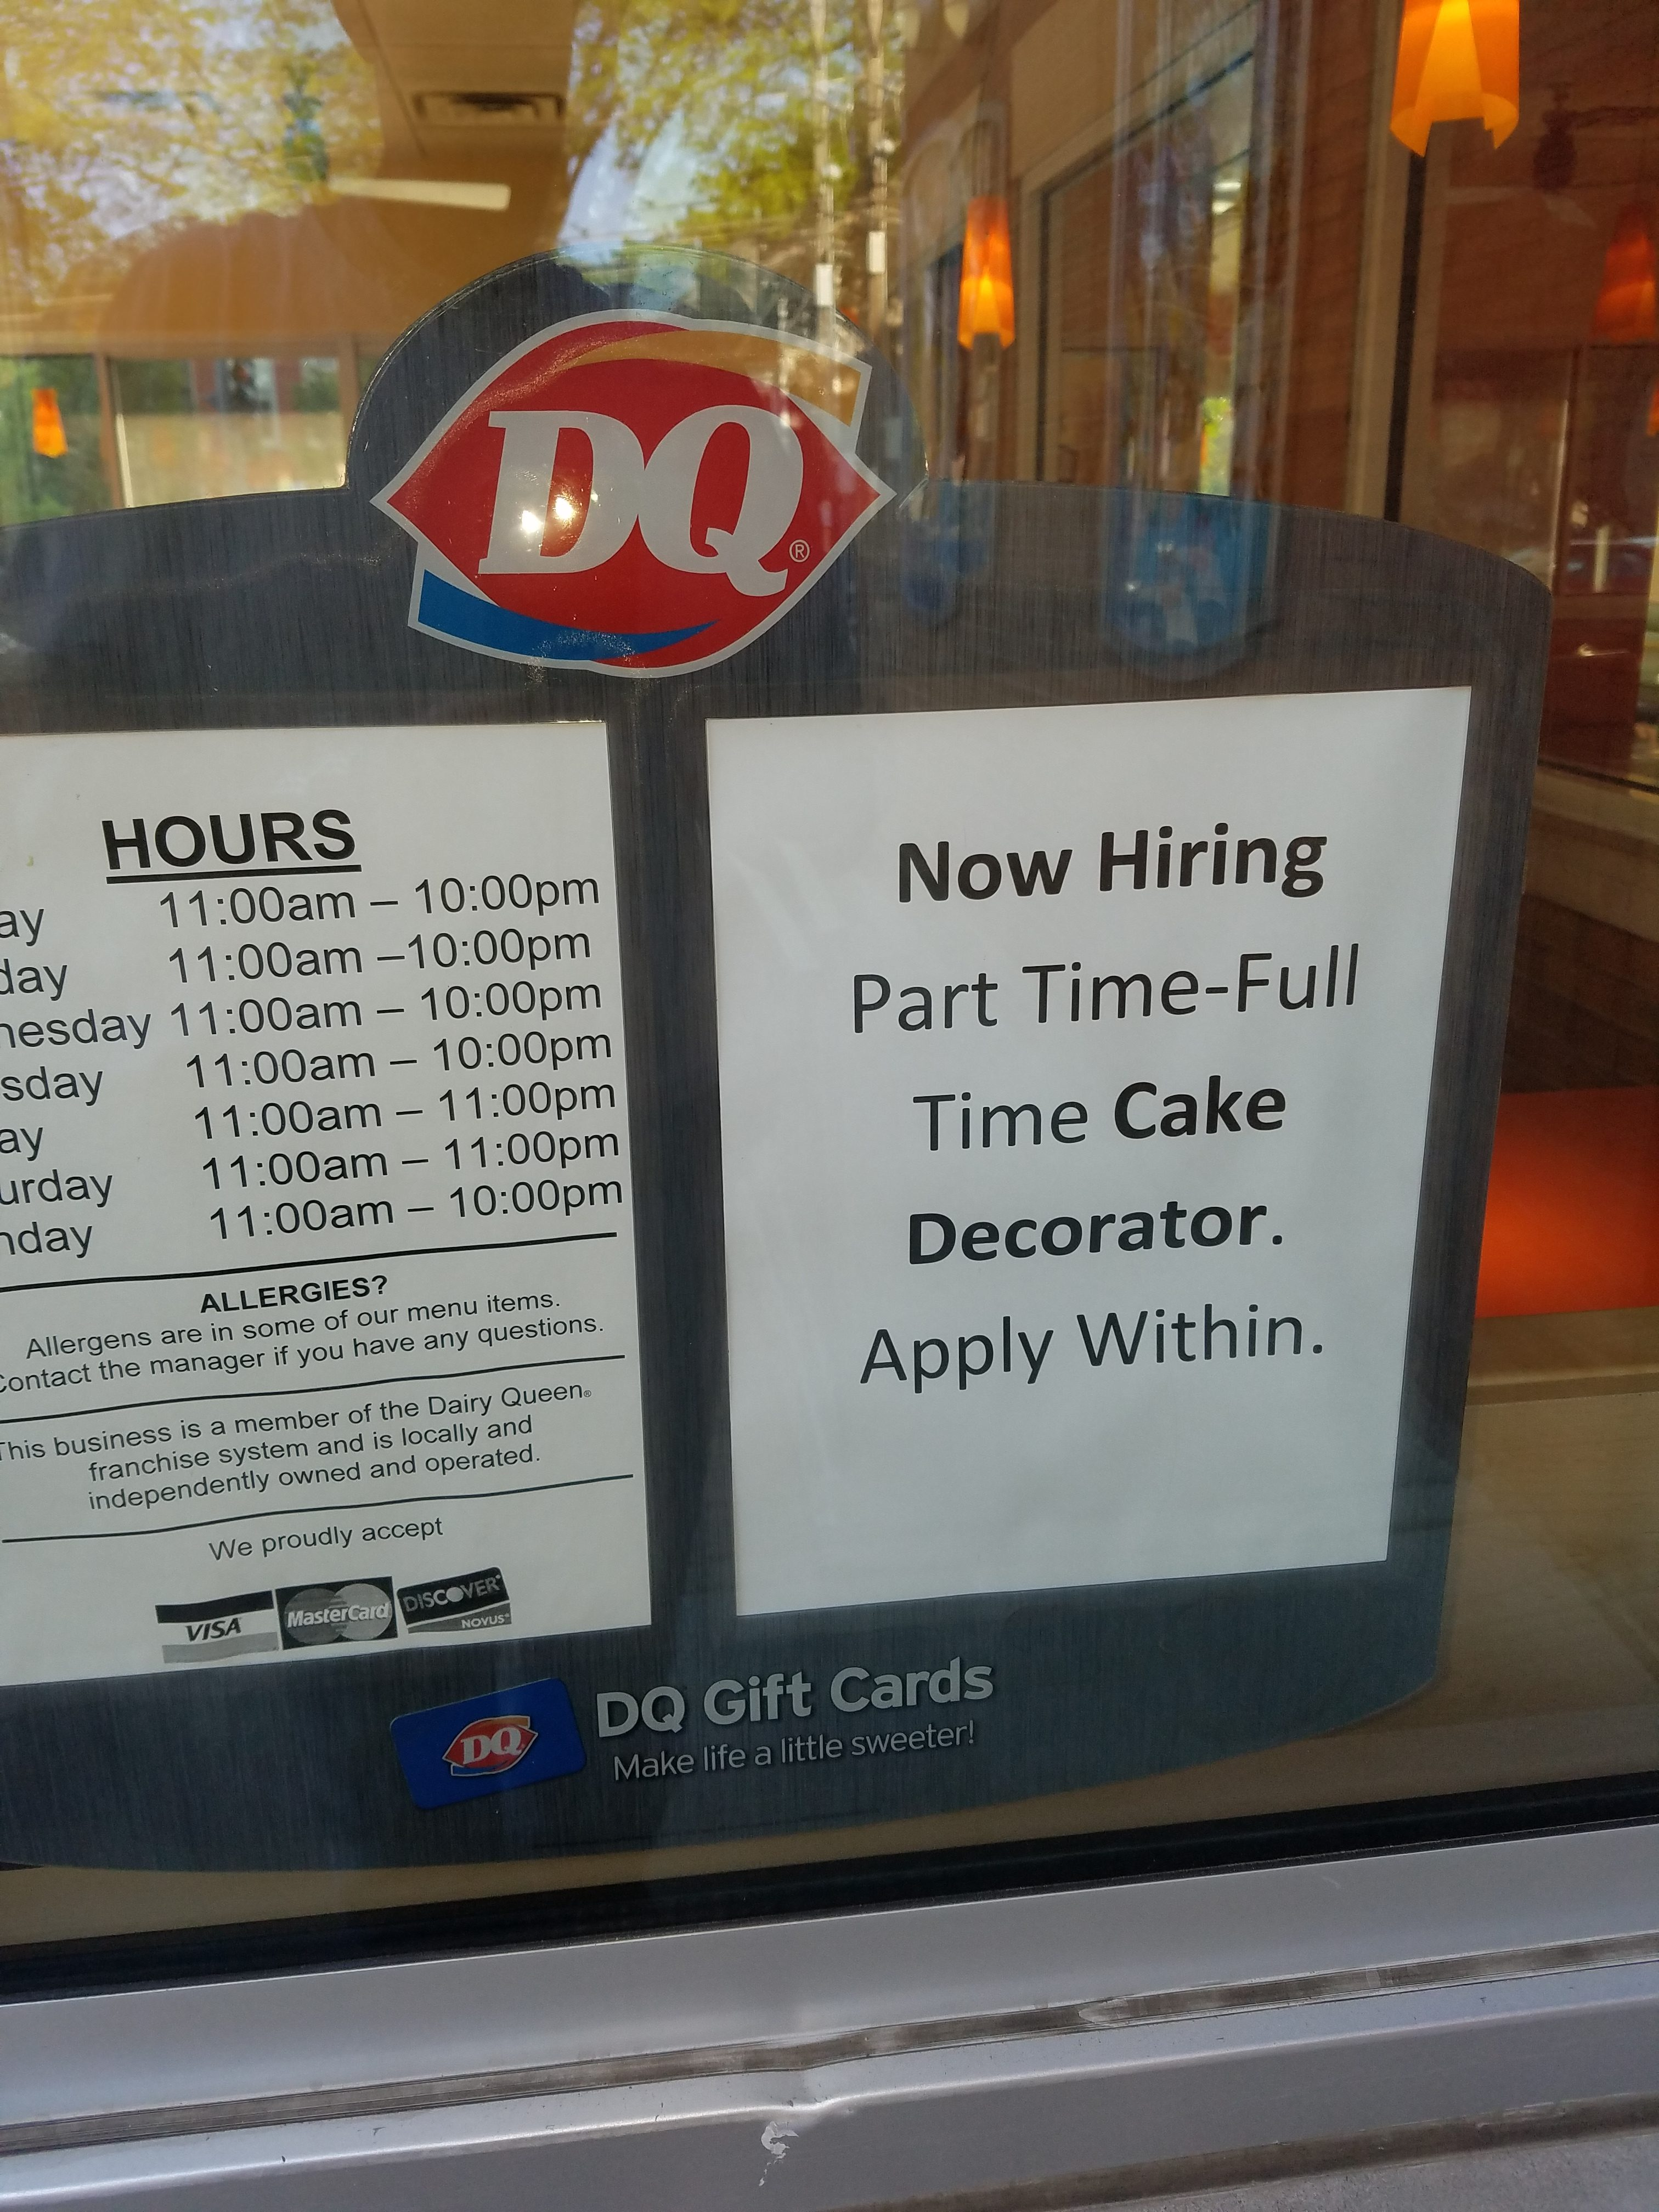 The Perfect Job?